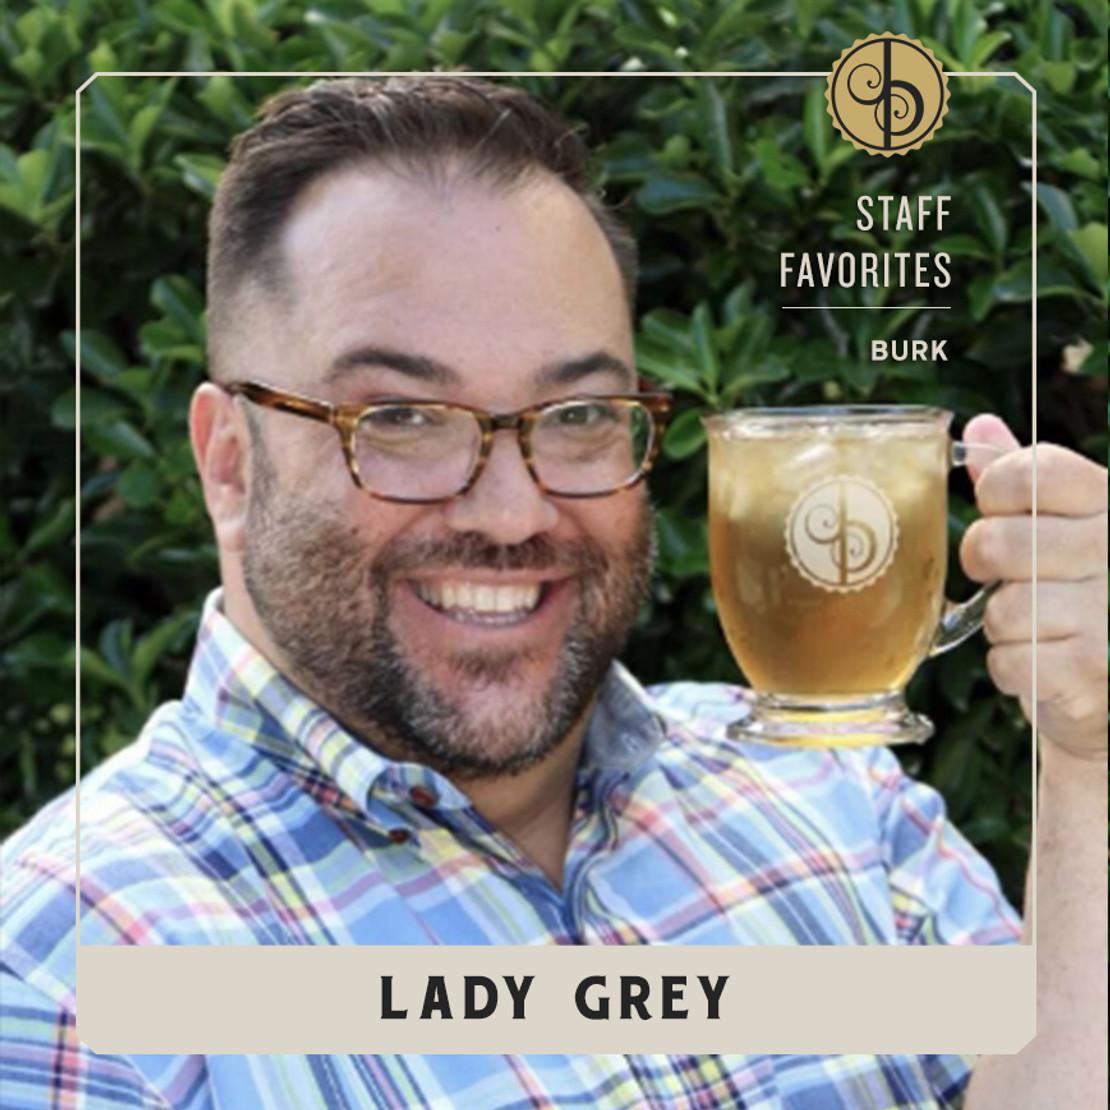 Staff Favorites: Burk & Lady Grey